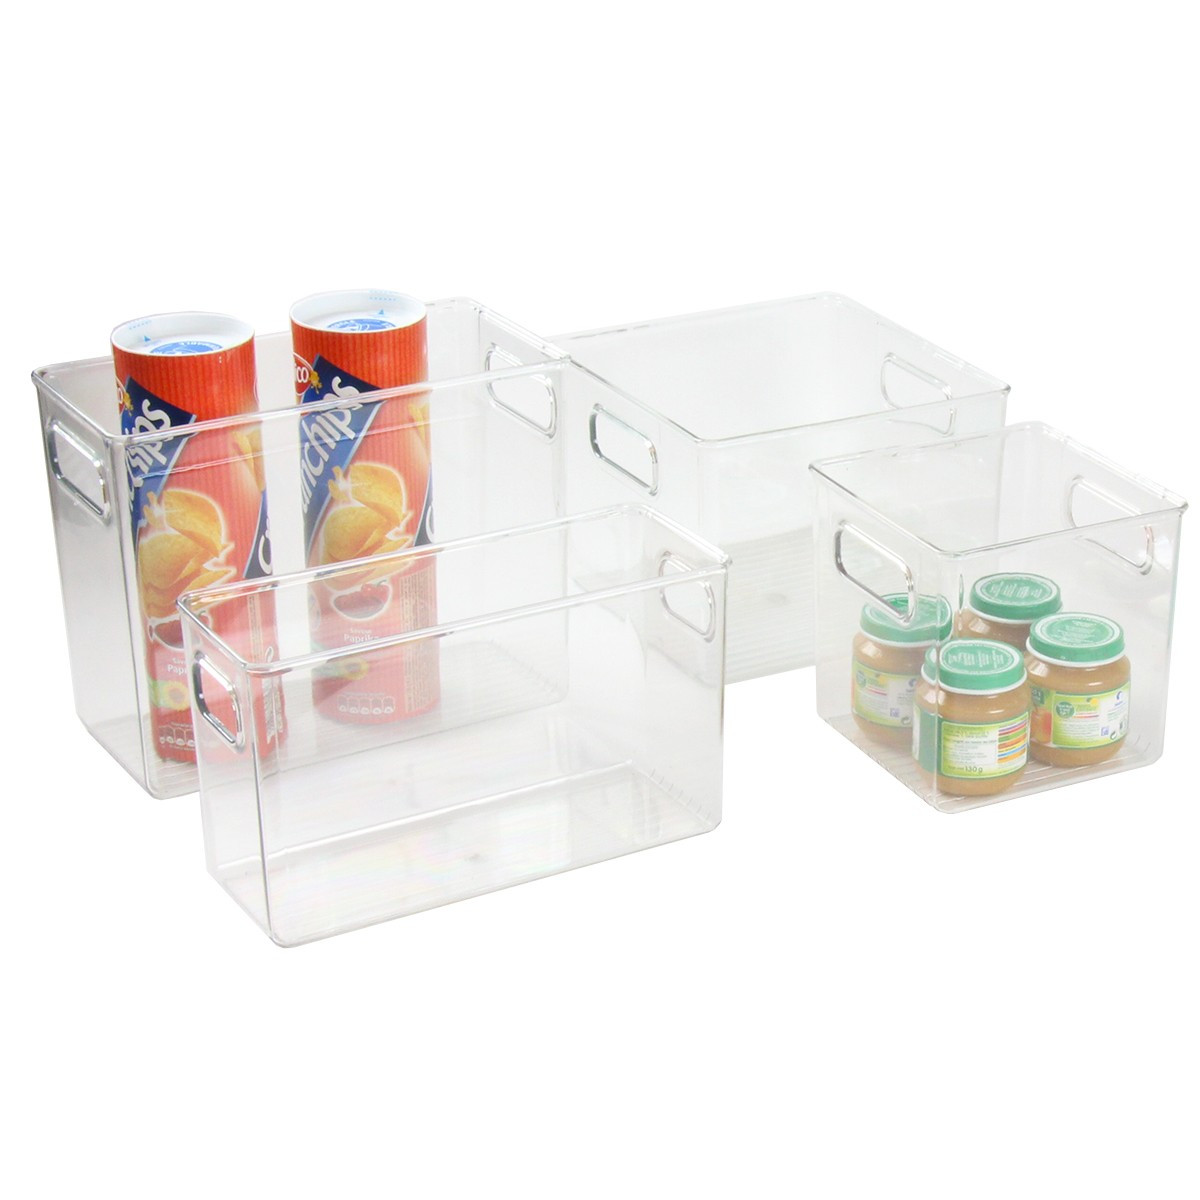 Organisateur placard ou r frig rateur rangement cuisine - Organisateur tiroir cuisine ...